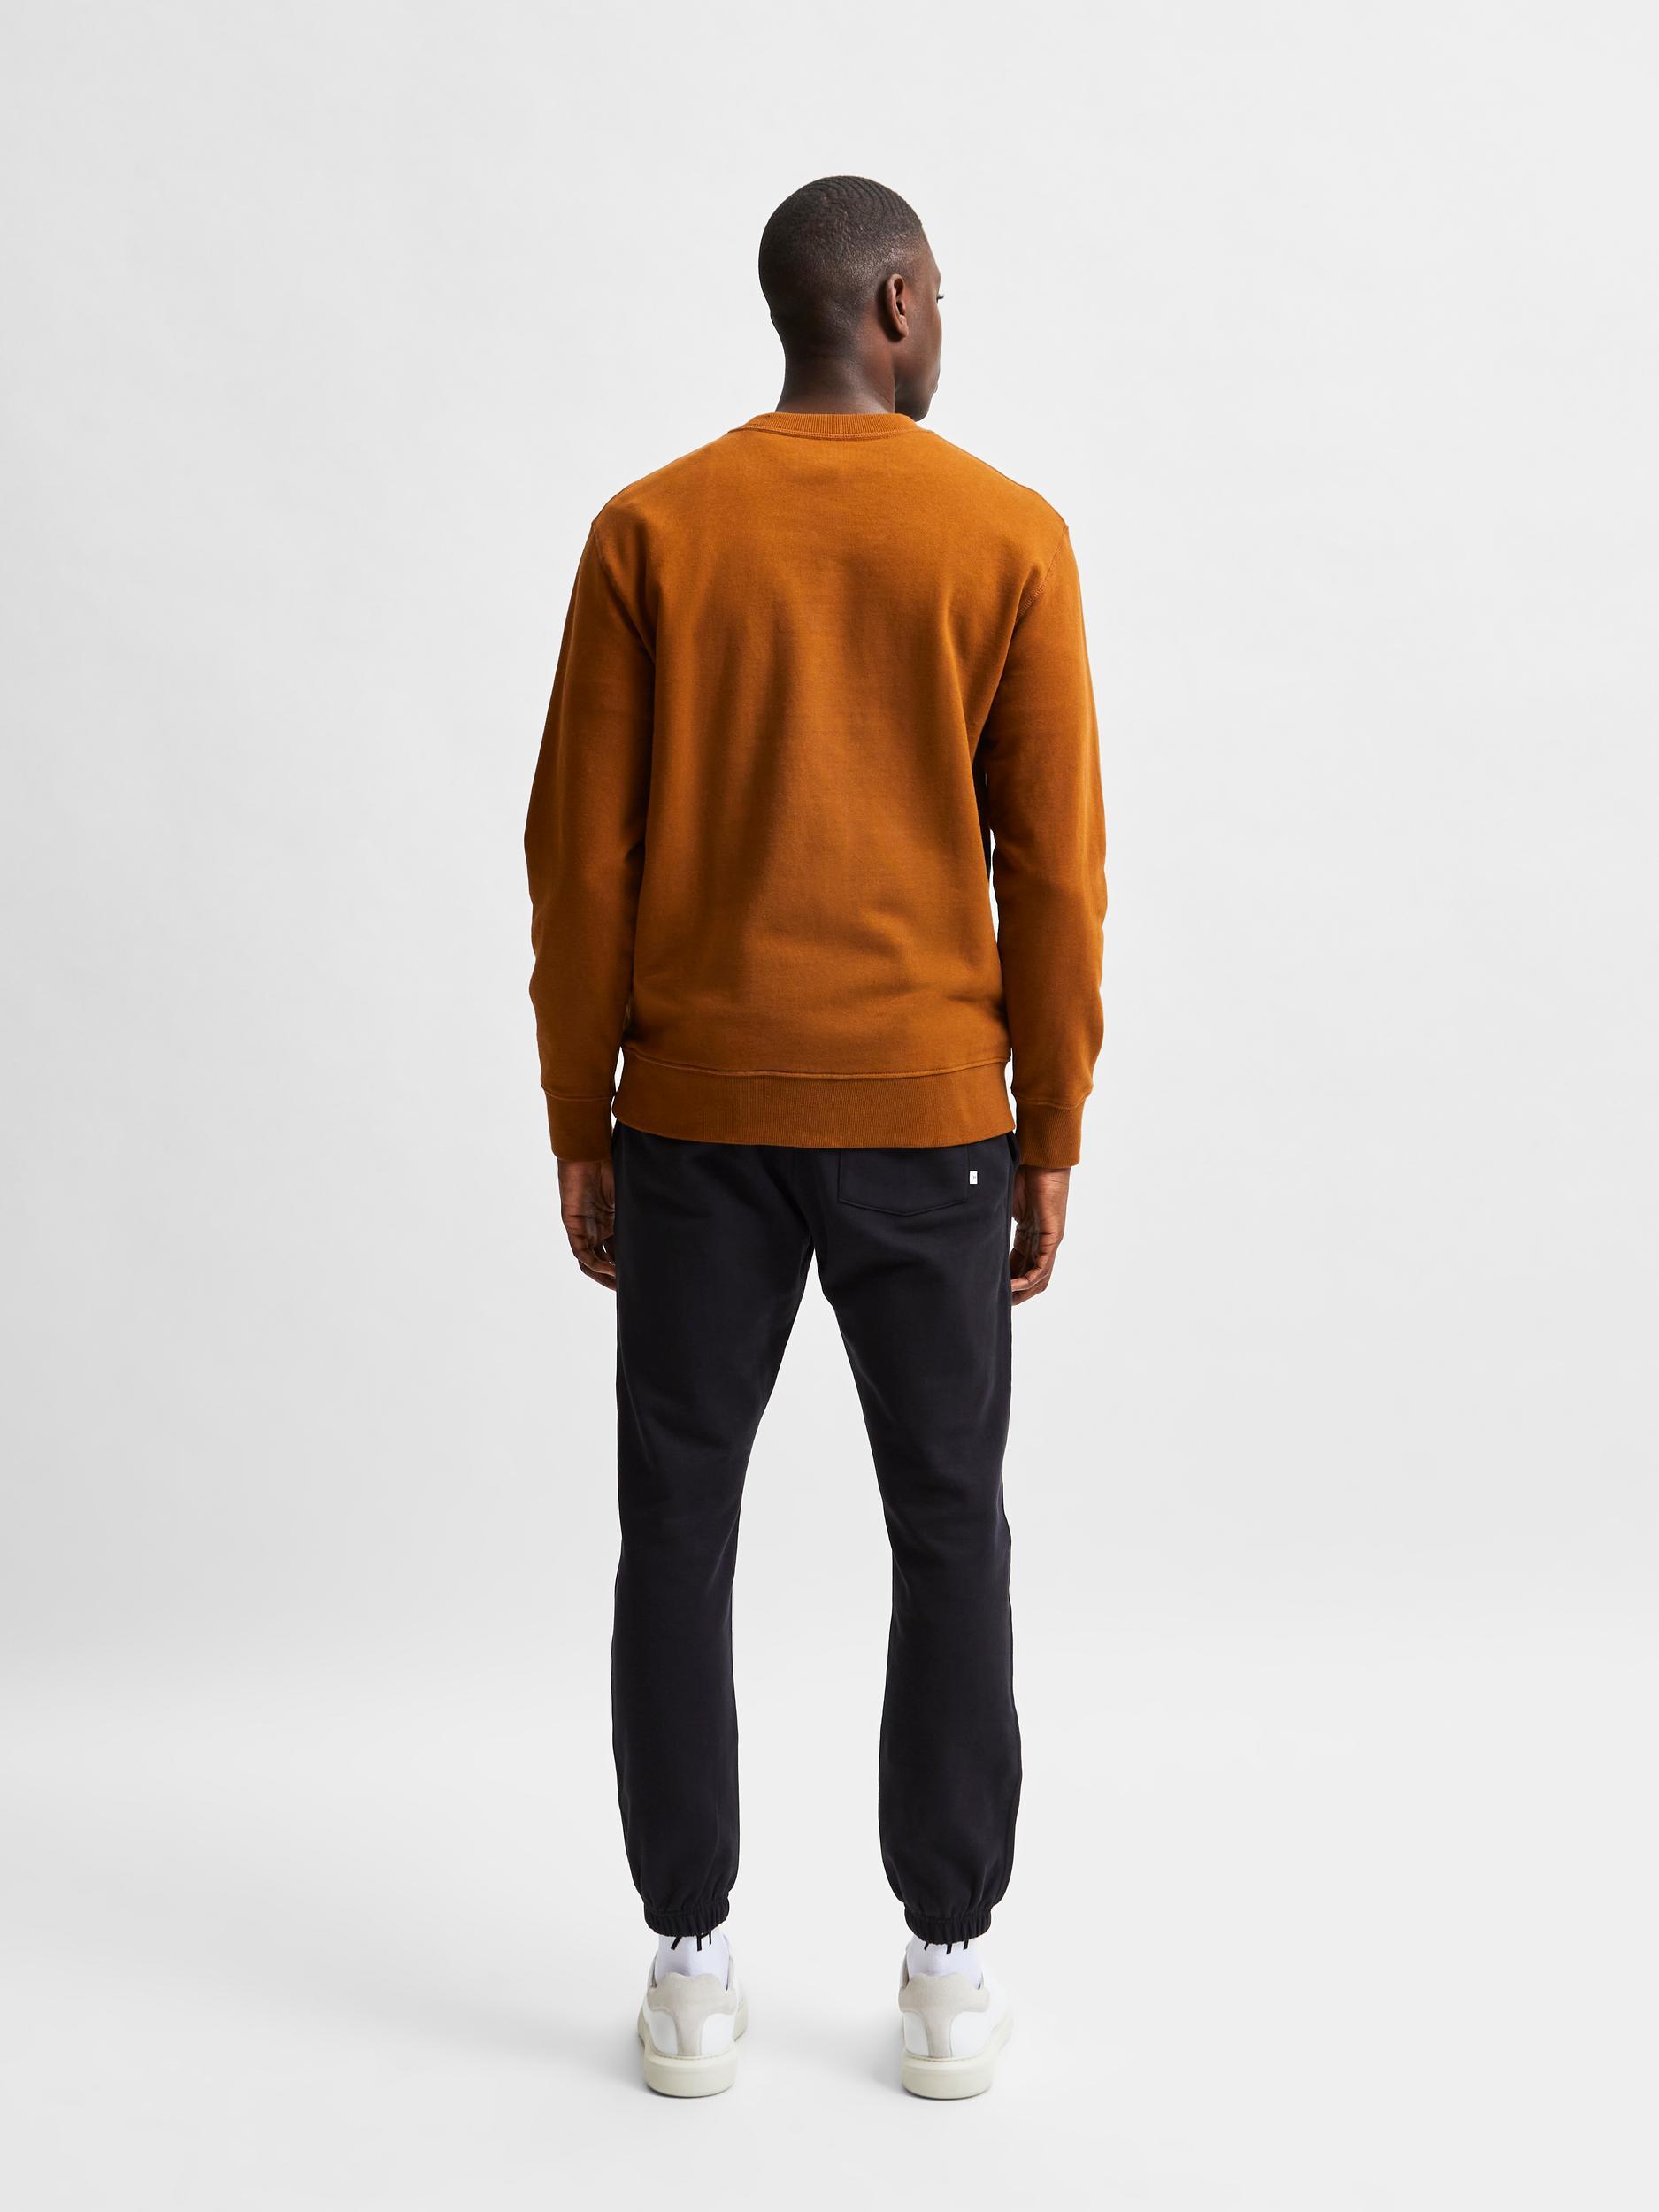 Selected Homme Jason Crew Neck sweatshirt, monks robe, x-large